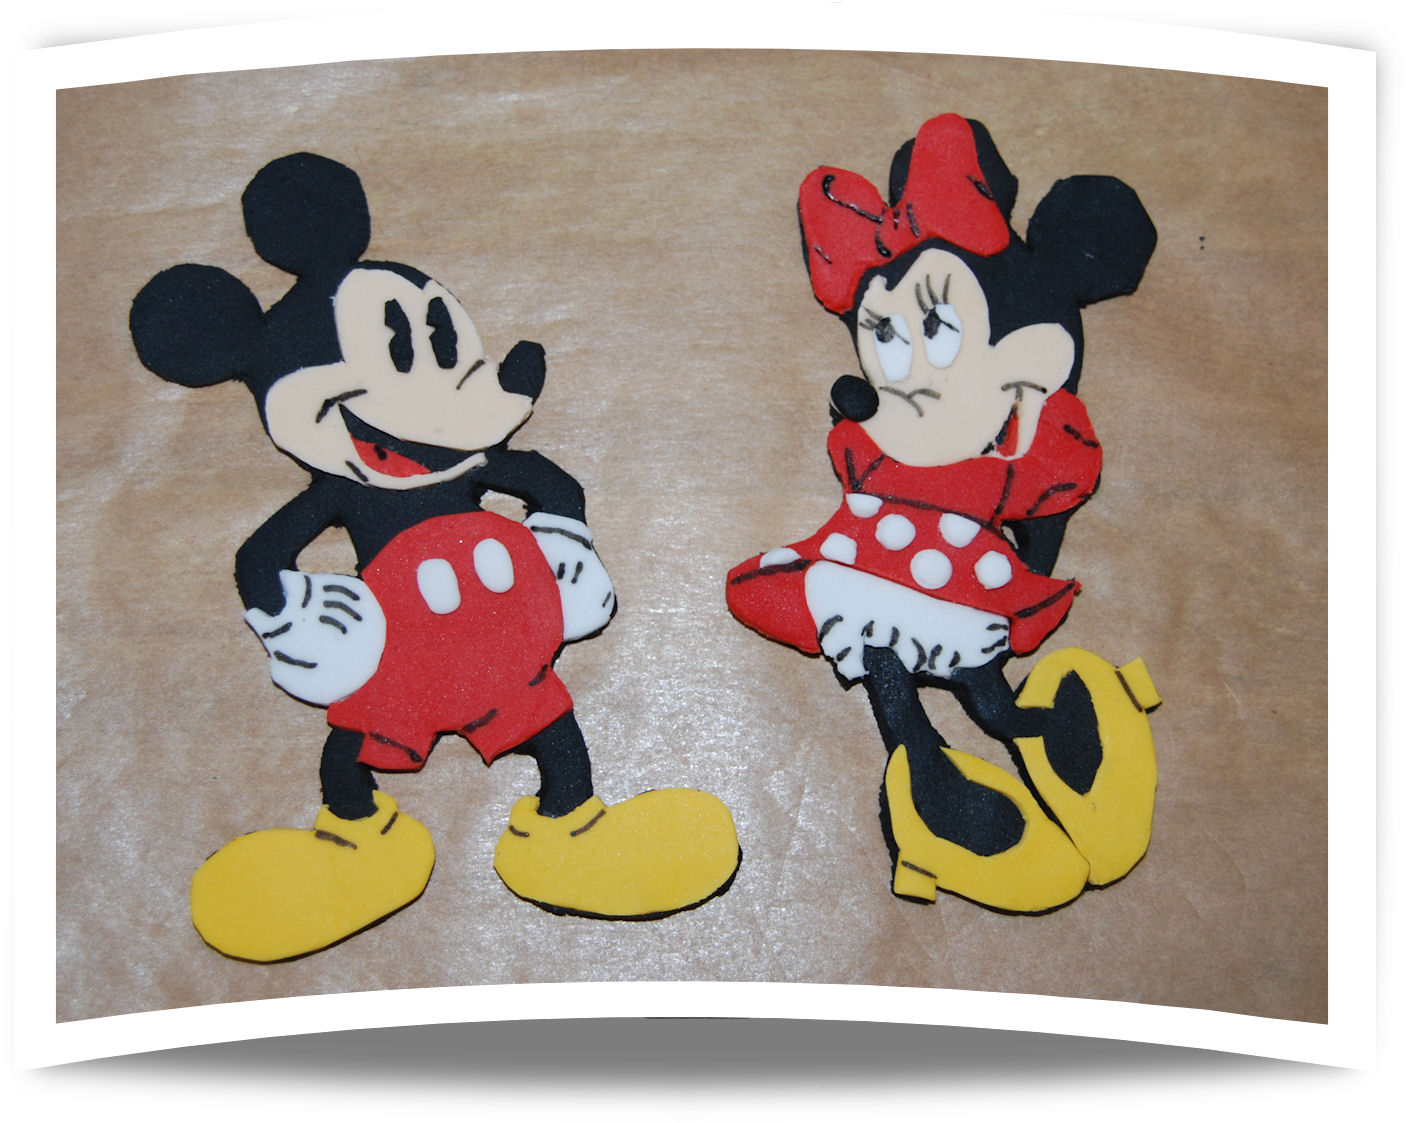 jarige mickey mouse plaatjes